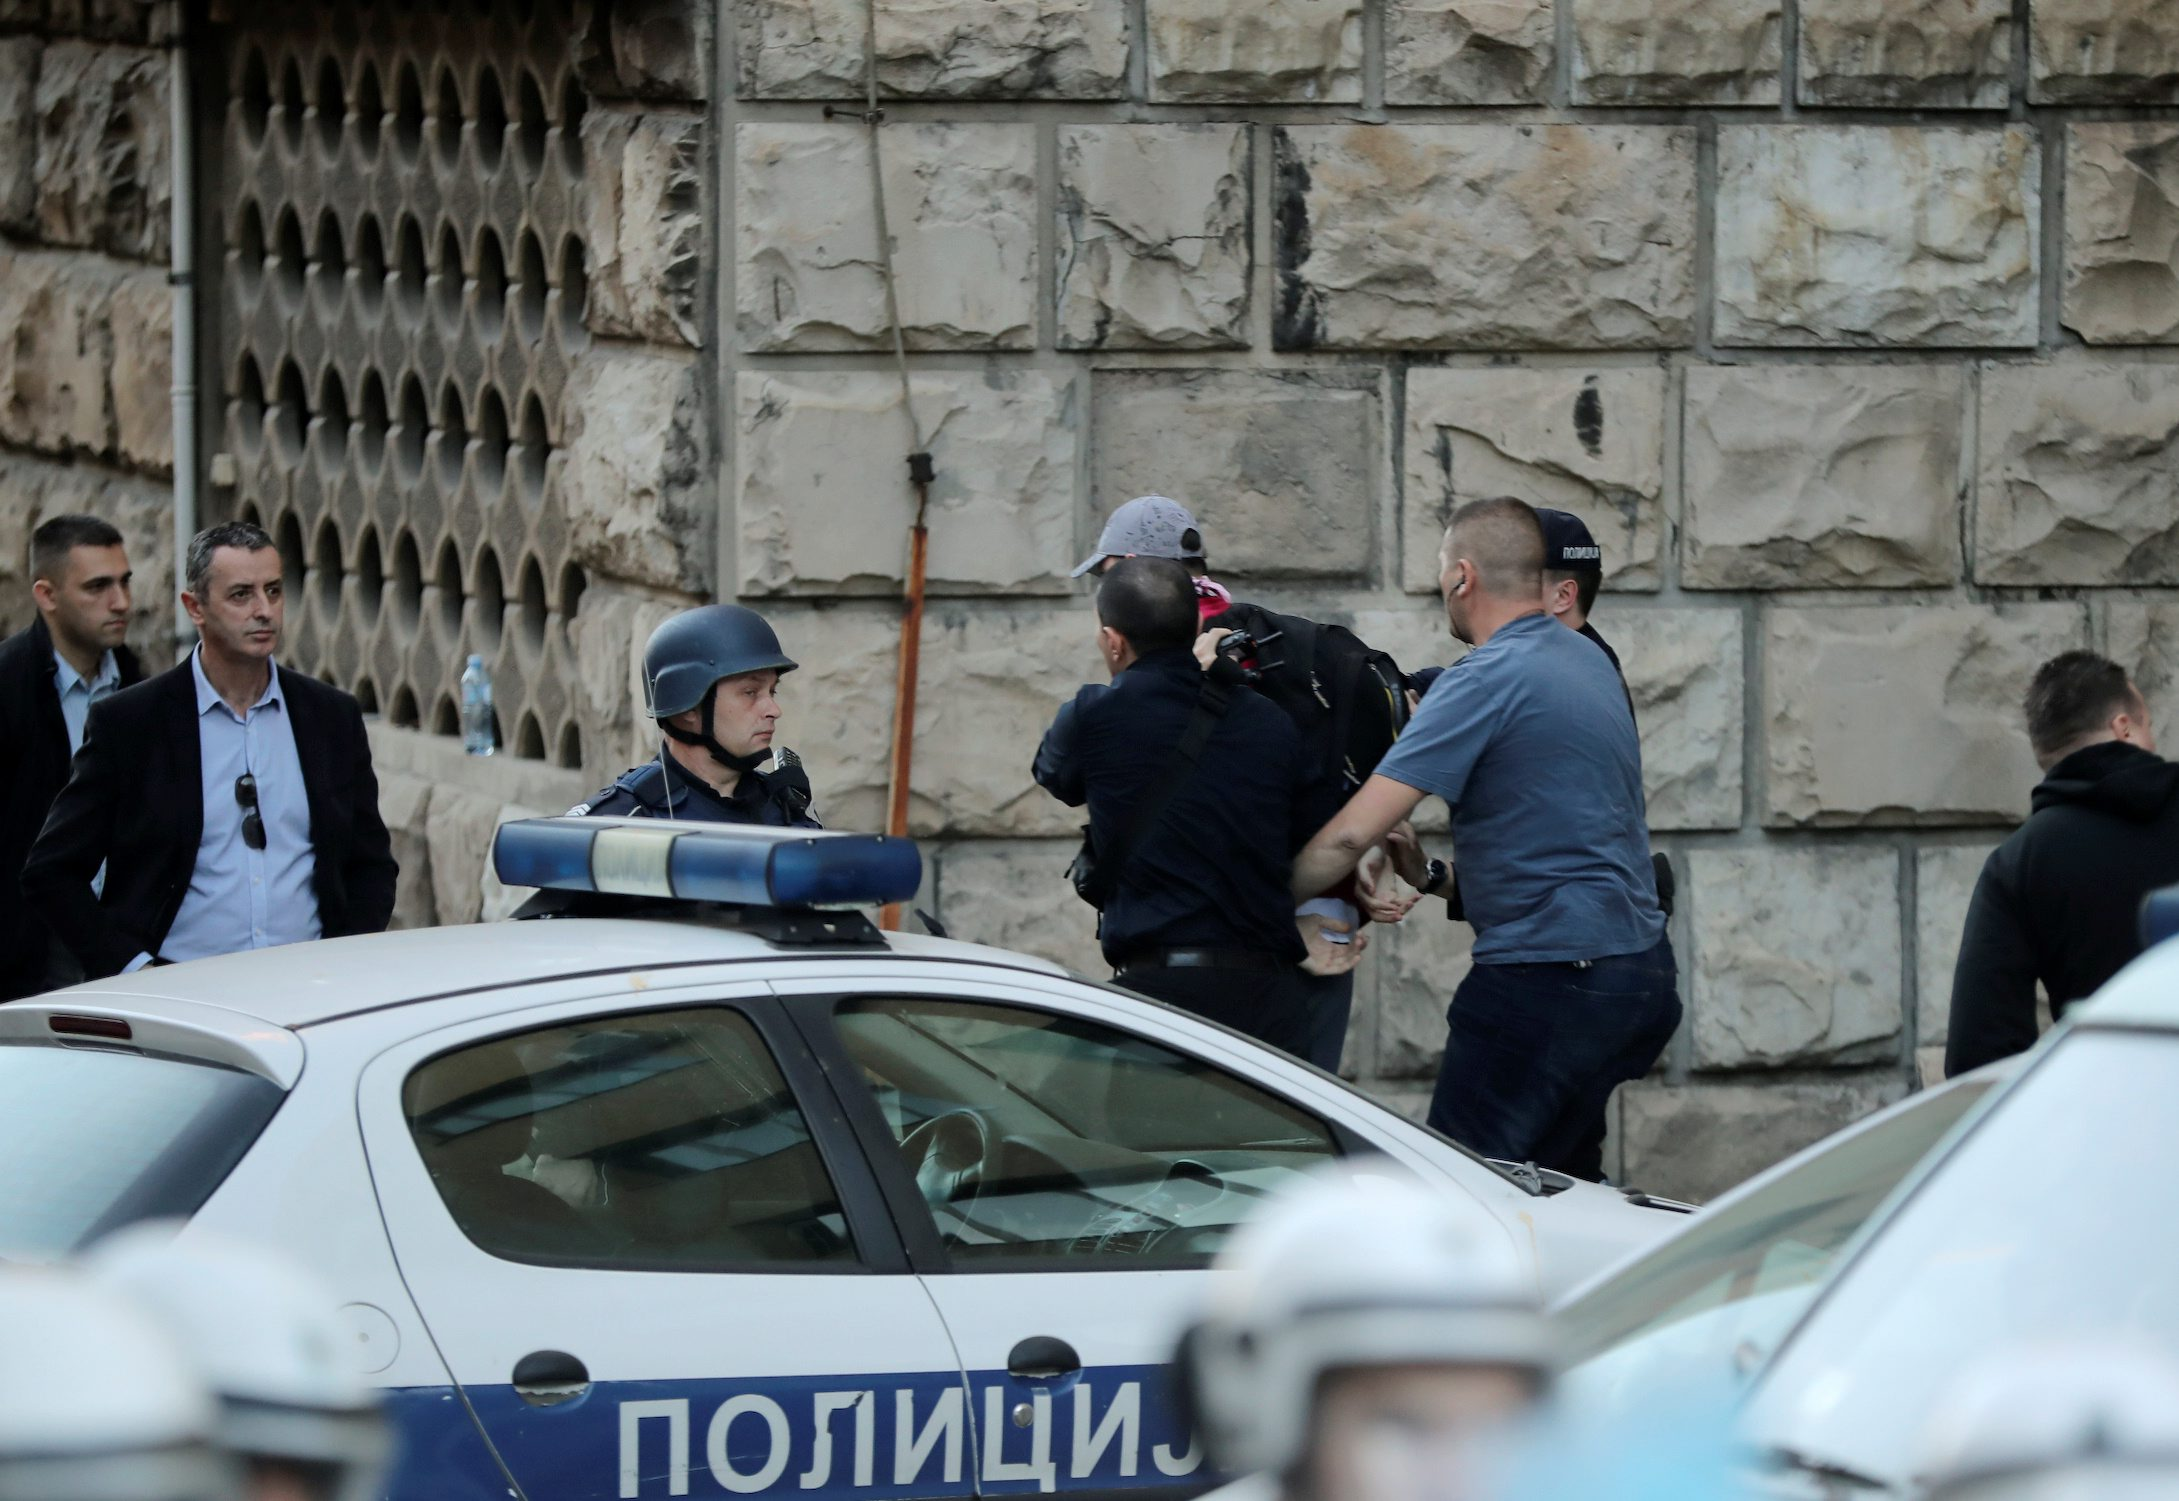 2019-03-17T162024Z_2081466097_RC1F6FF3EDF0_RTRMADP_3_SERBIA-PROTESTS